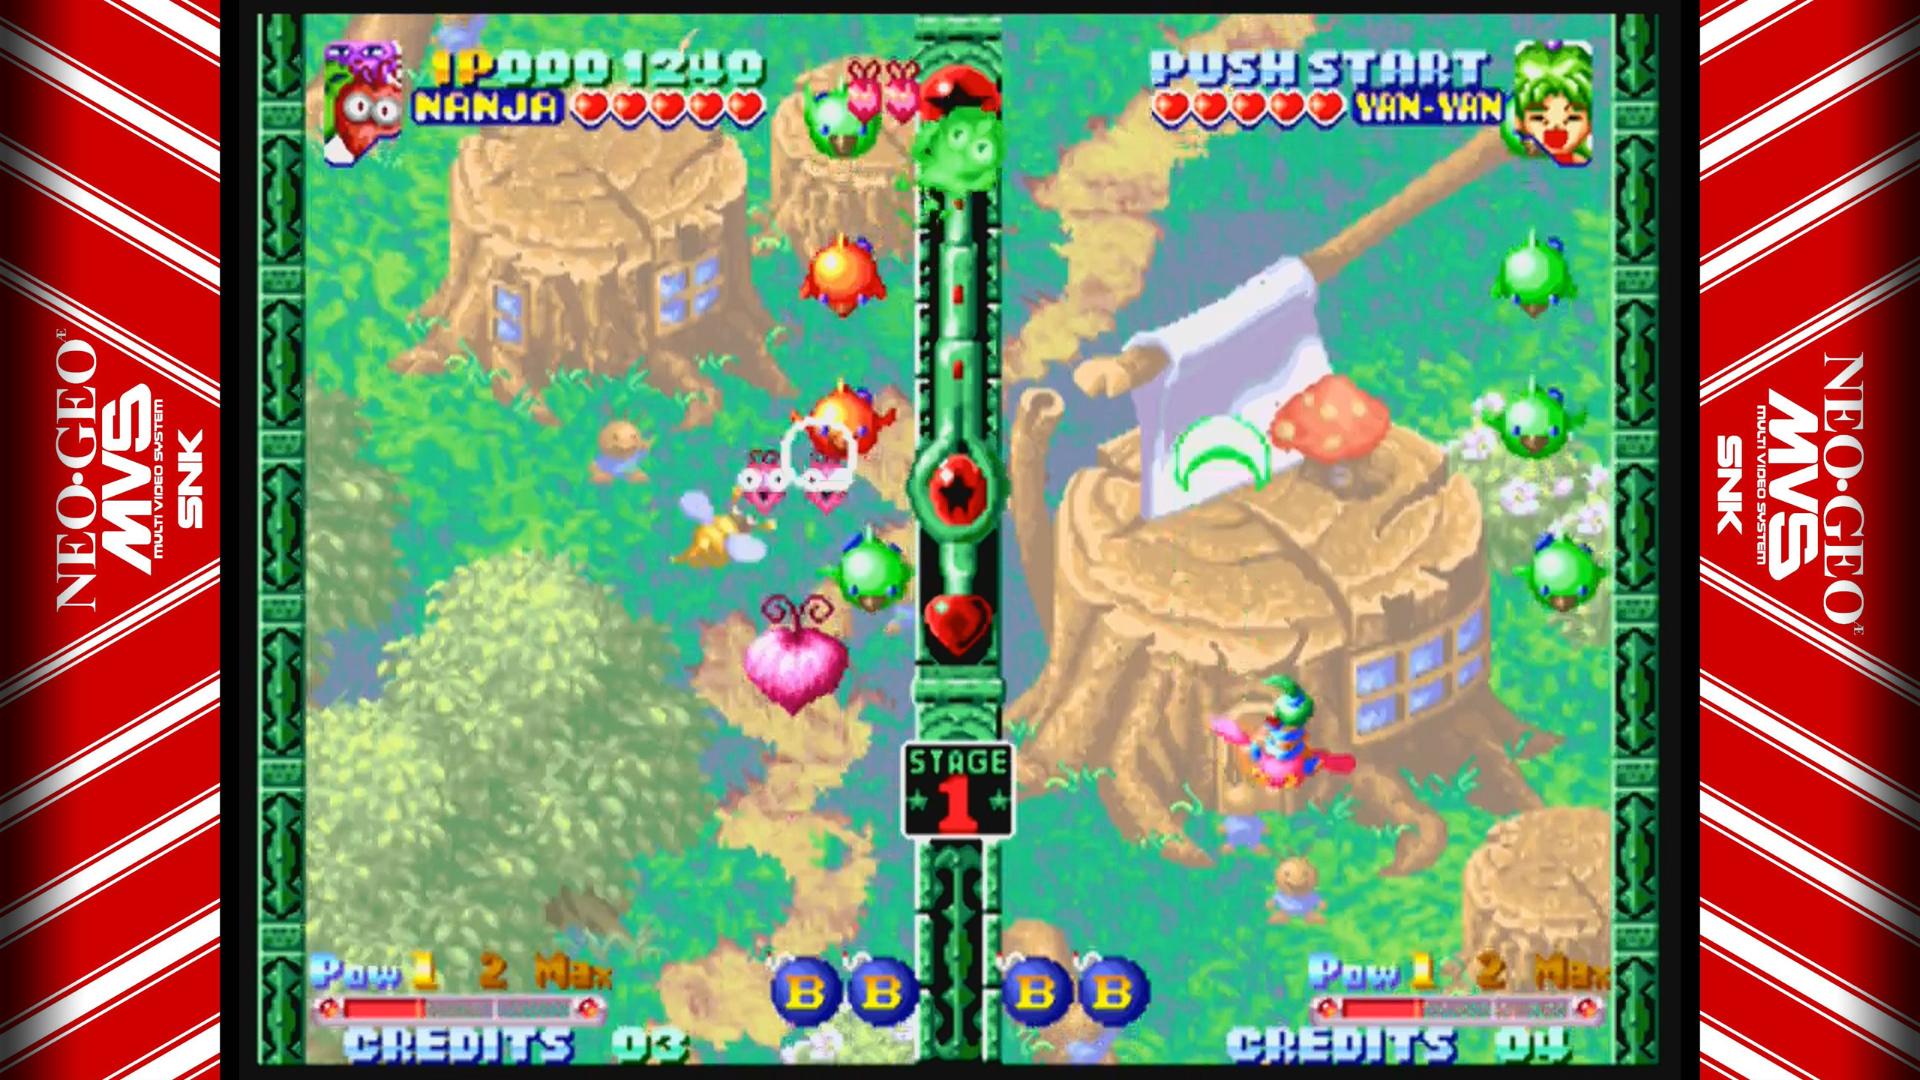 The Samurai Shodown Neo Geo Mini has better games, but it's still